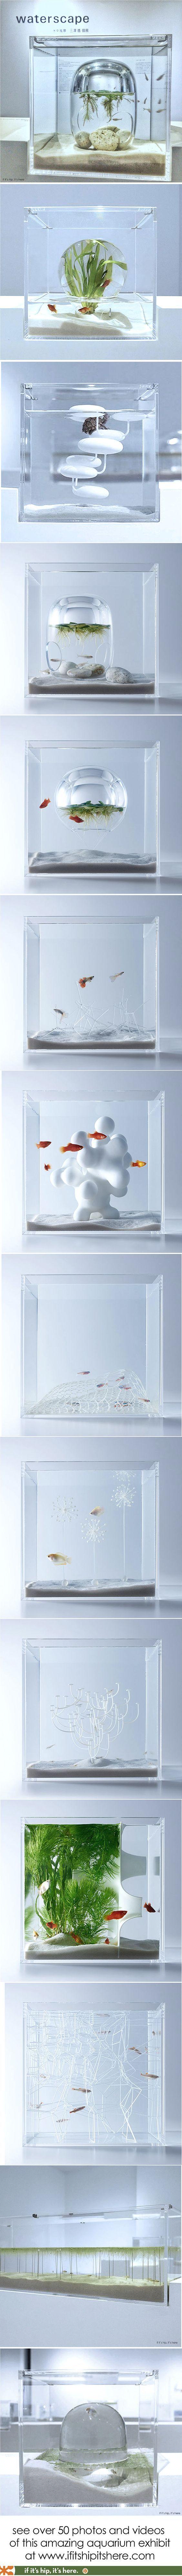 best aqurium images on pinterest